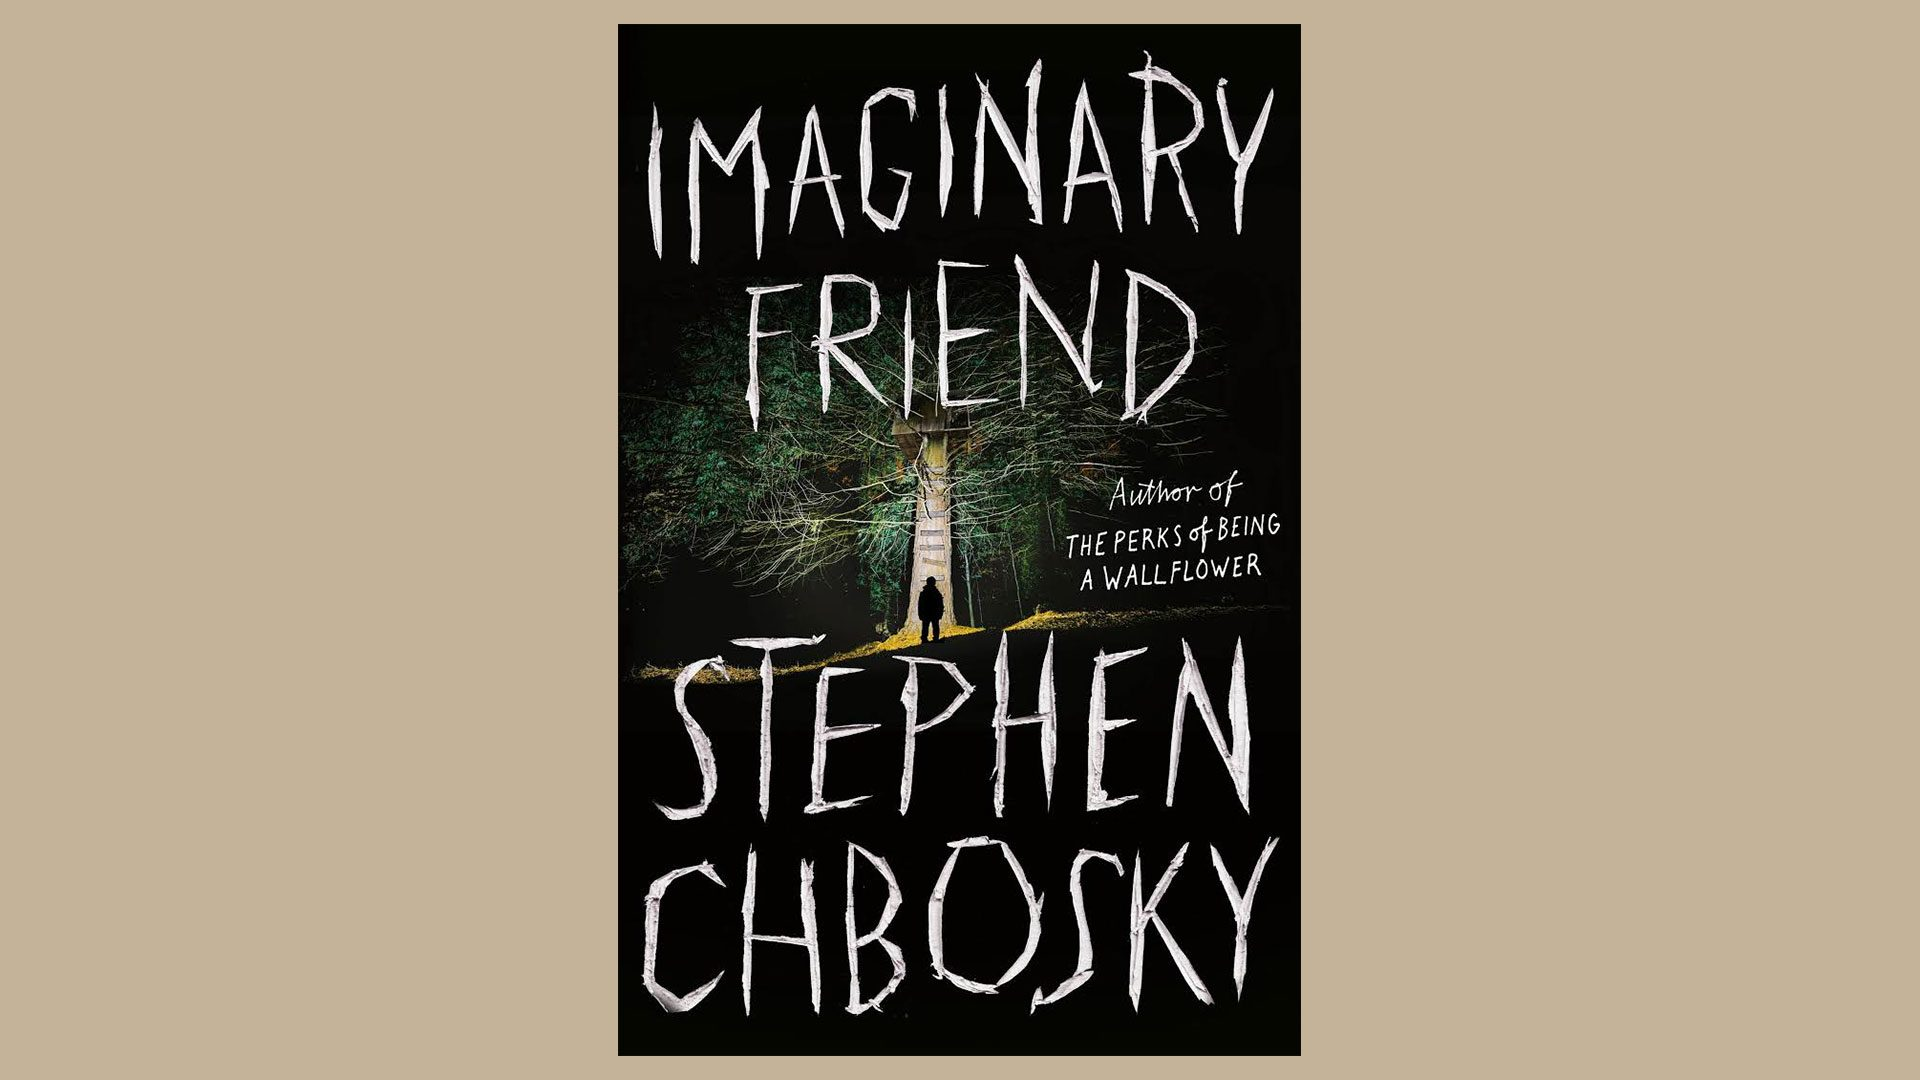 'Imaginary Friend' by Stephen Chbosky